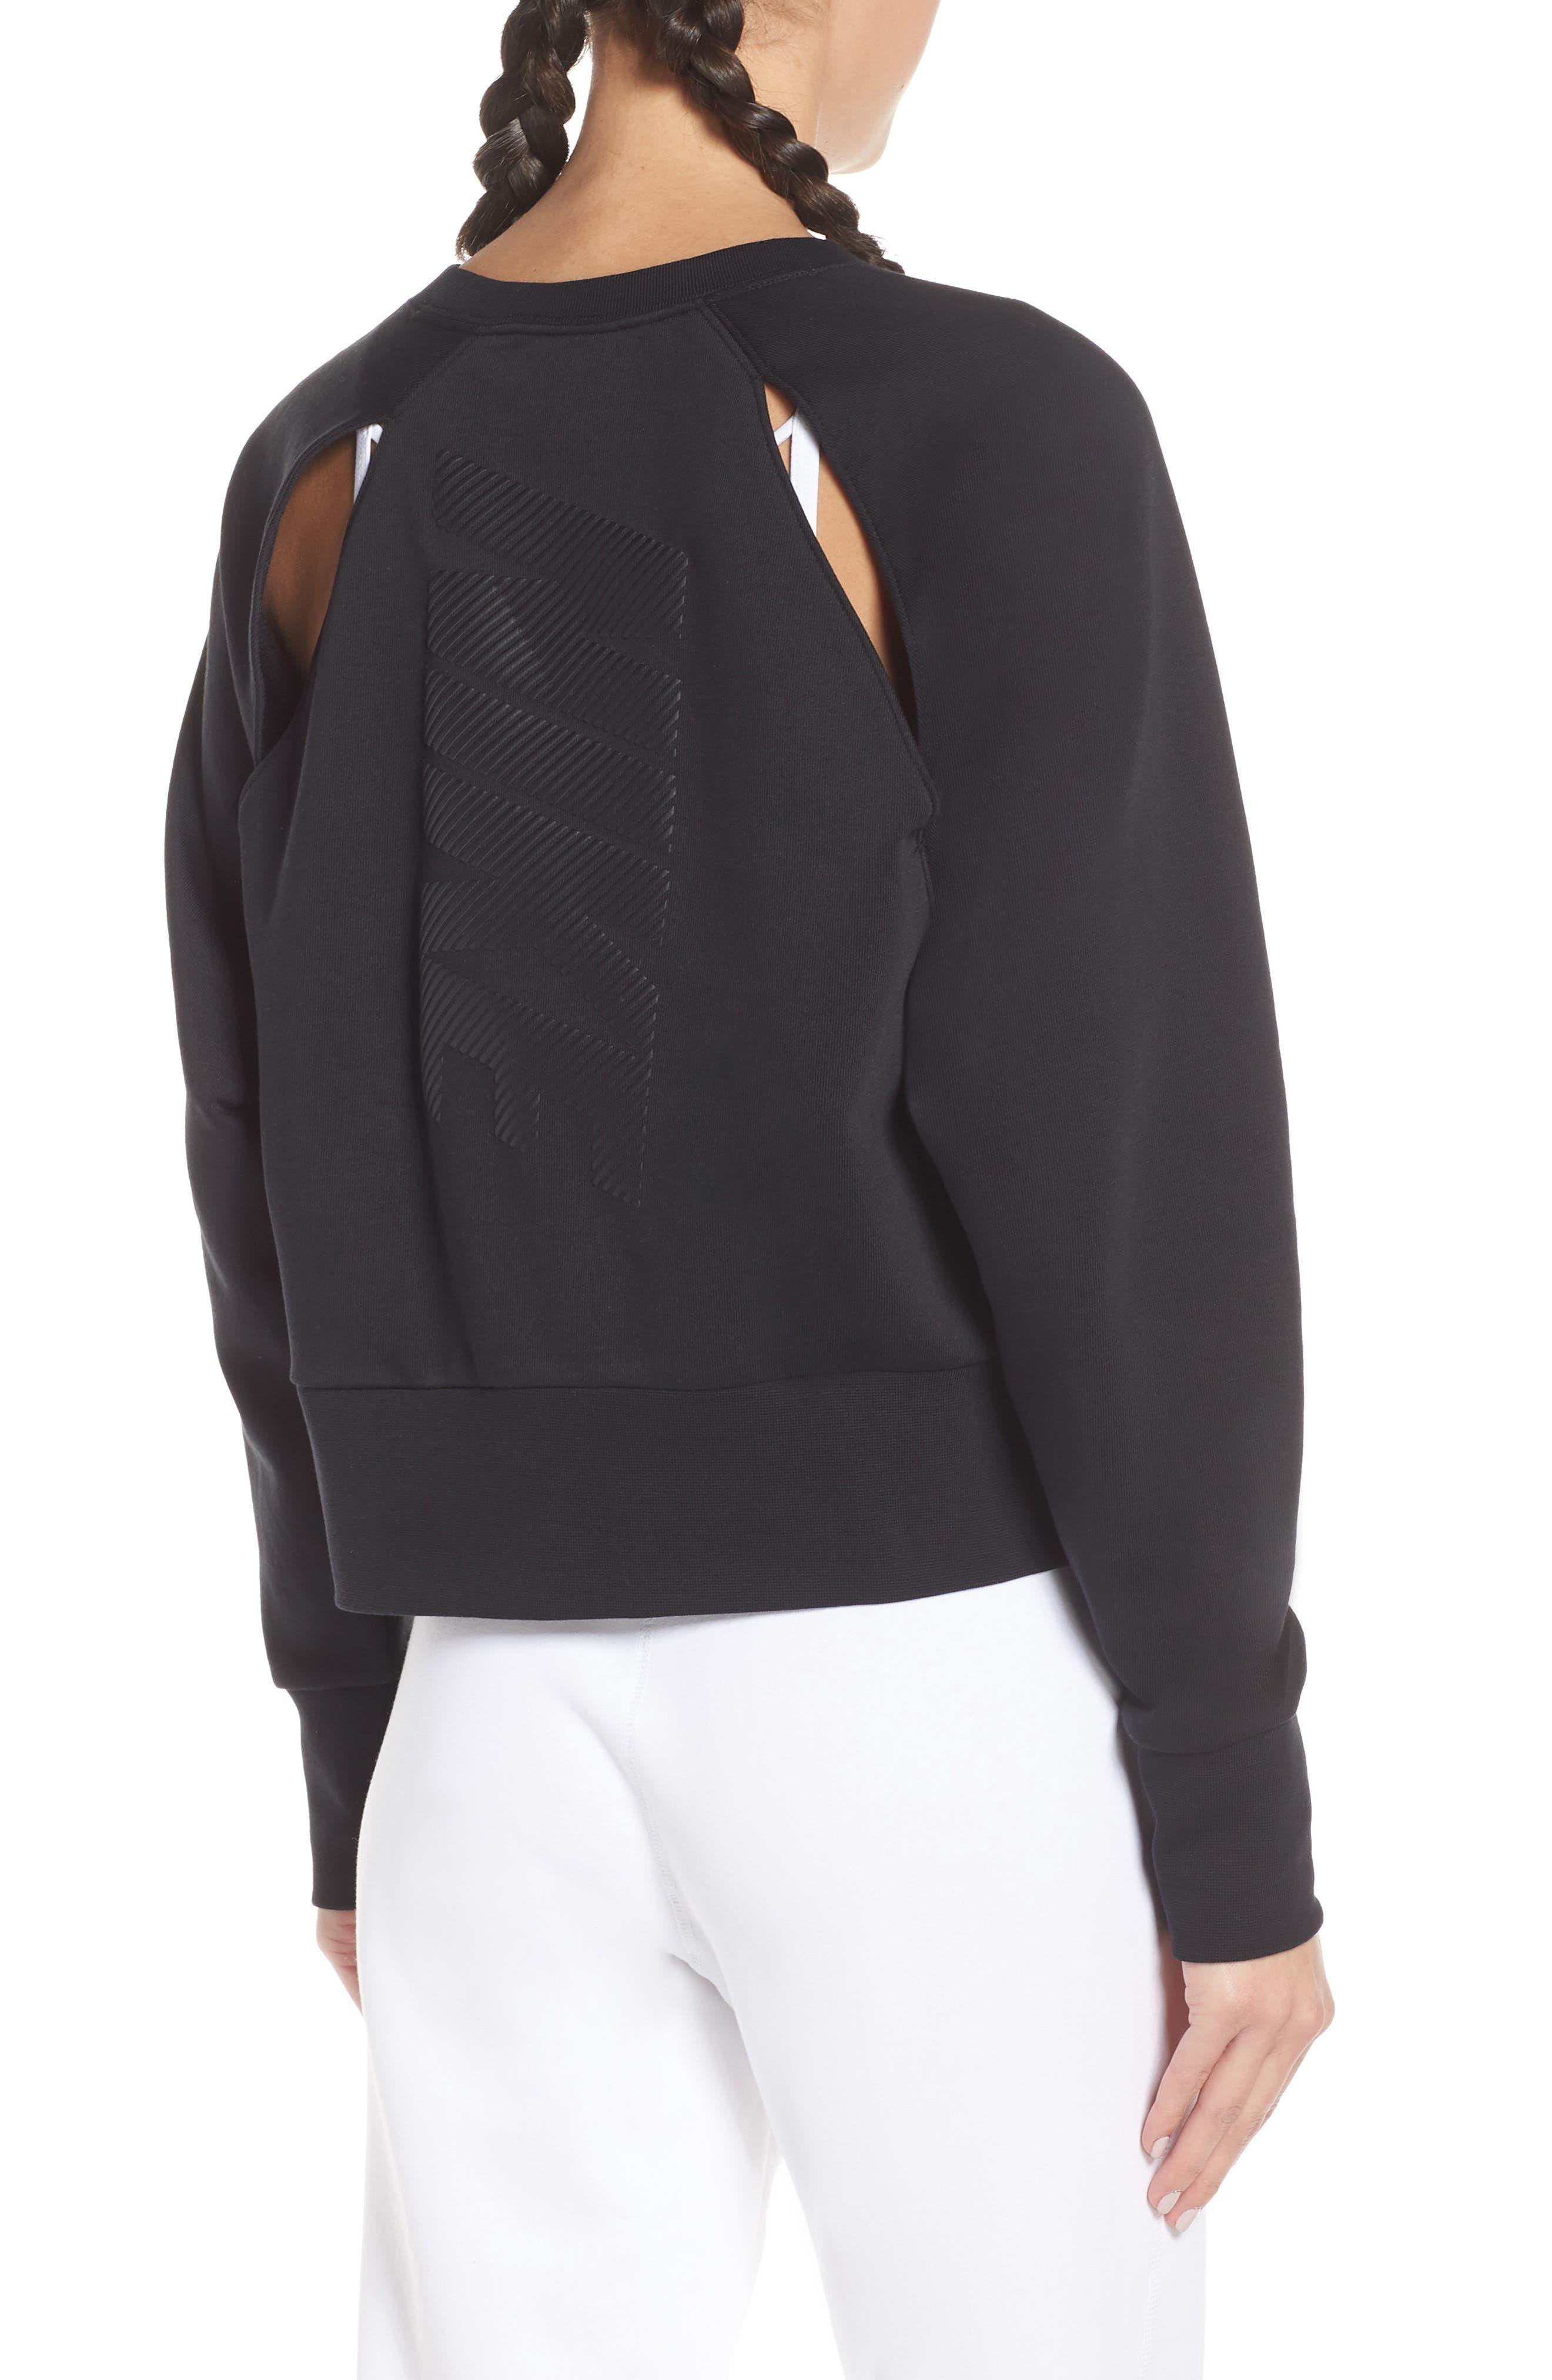 NIKE, Dry Crop Training Sweatshirt, Alternate thumbnail 2, color, BLACK/ WHITE